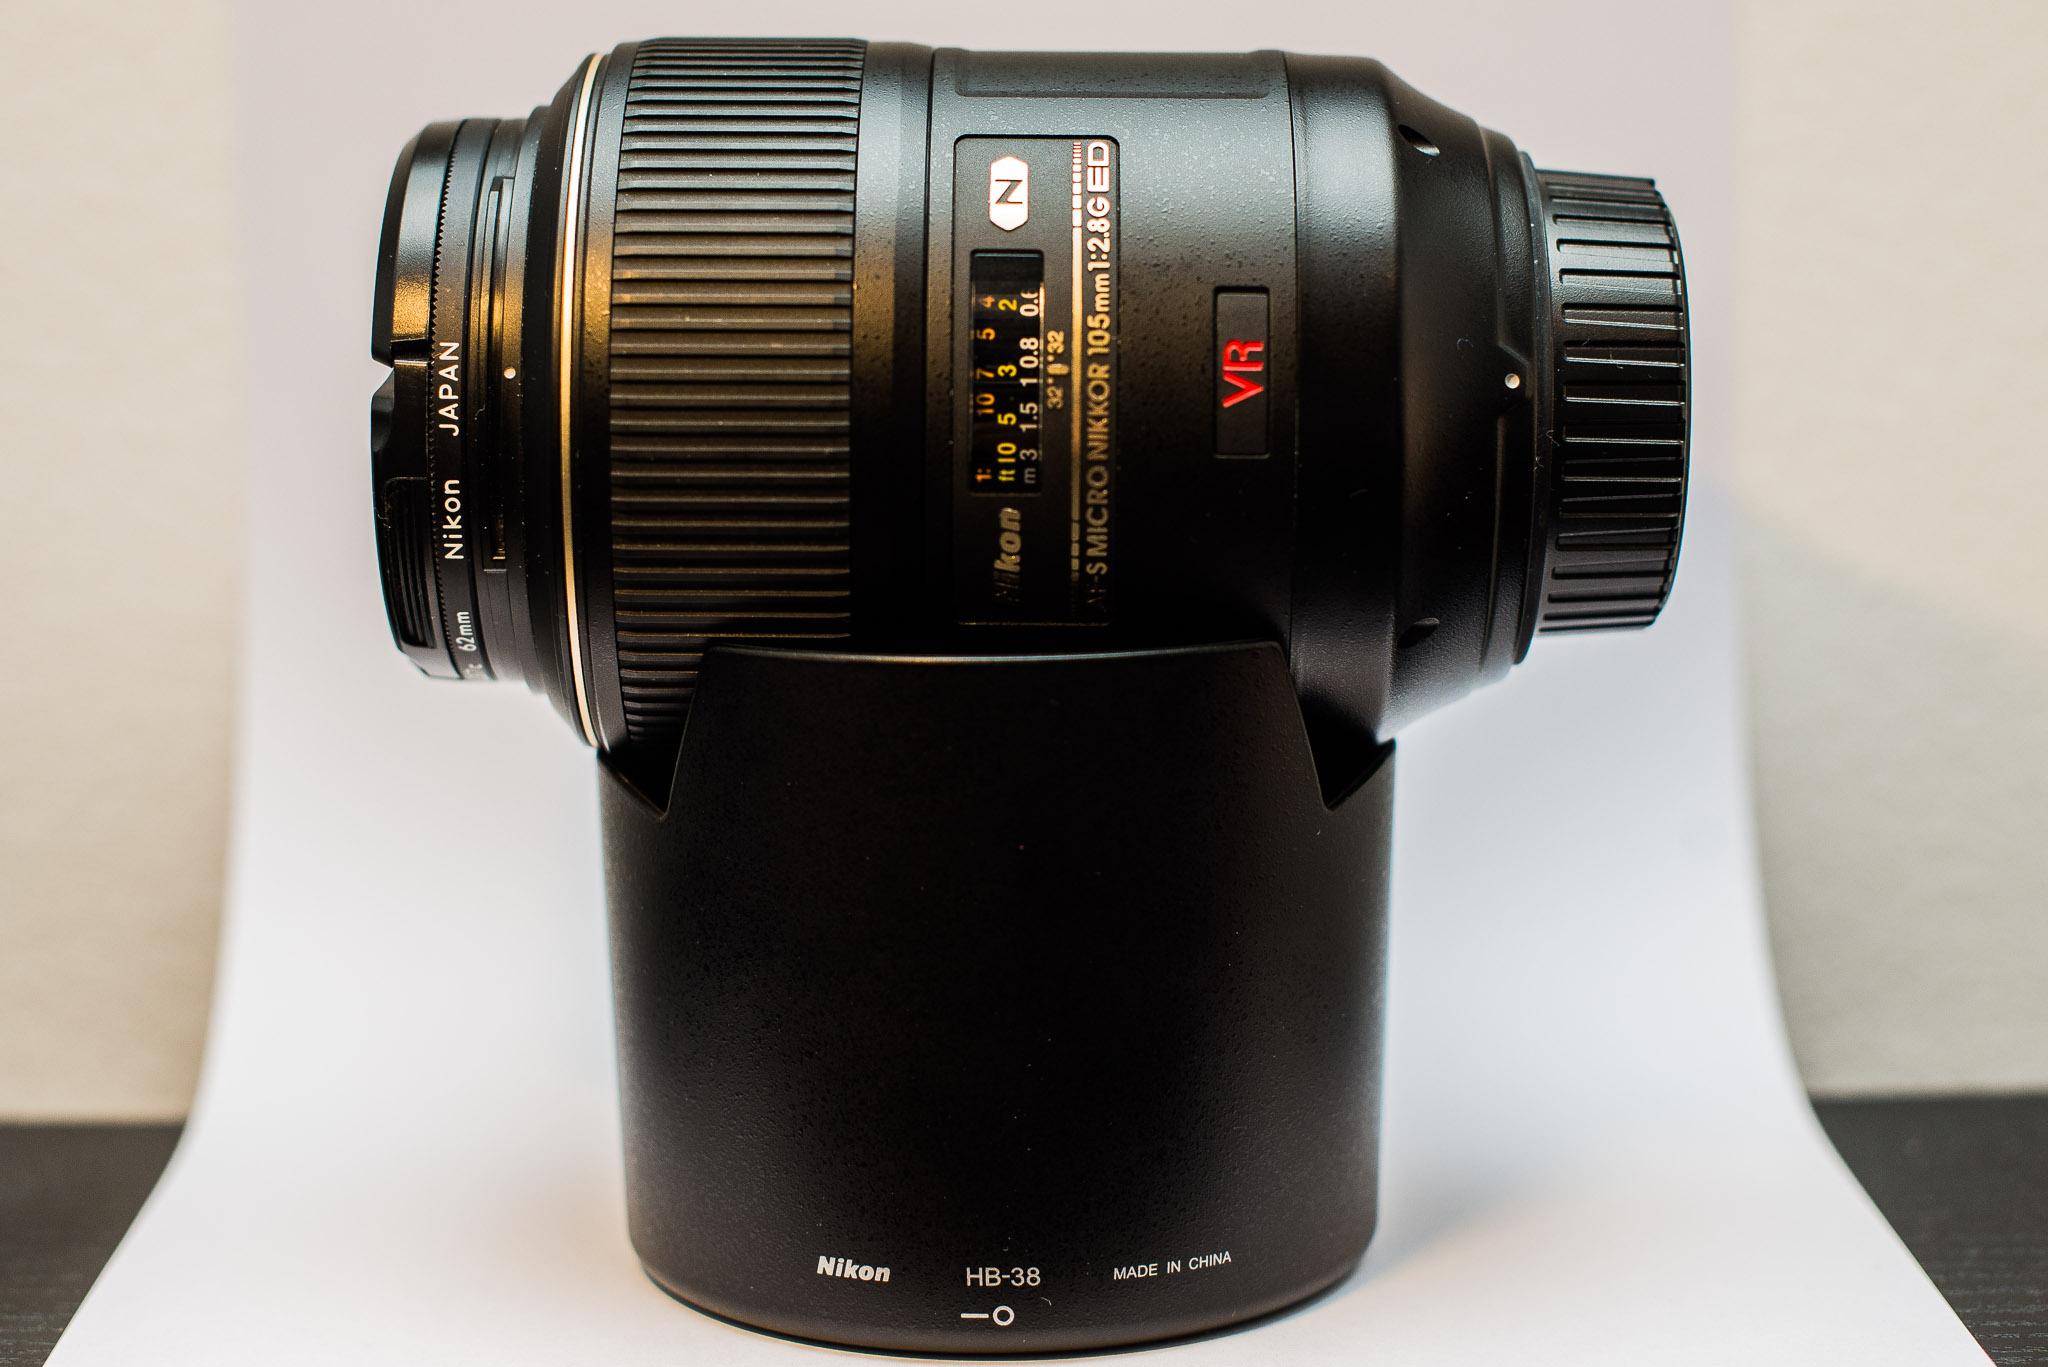 For Sale Nikon Af S Vr Micro Nikkor 105mm F 28g If Ed Dx Fisheye View Original Size